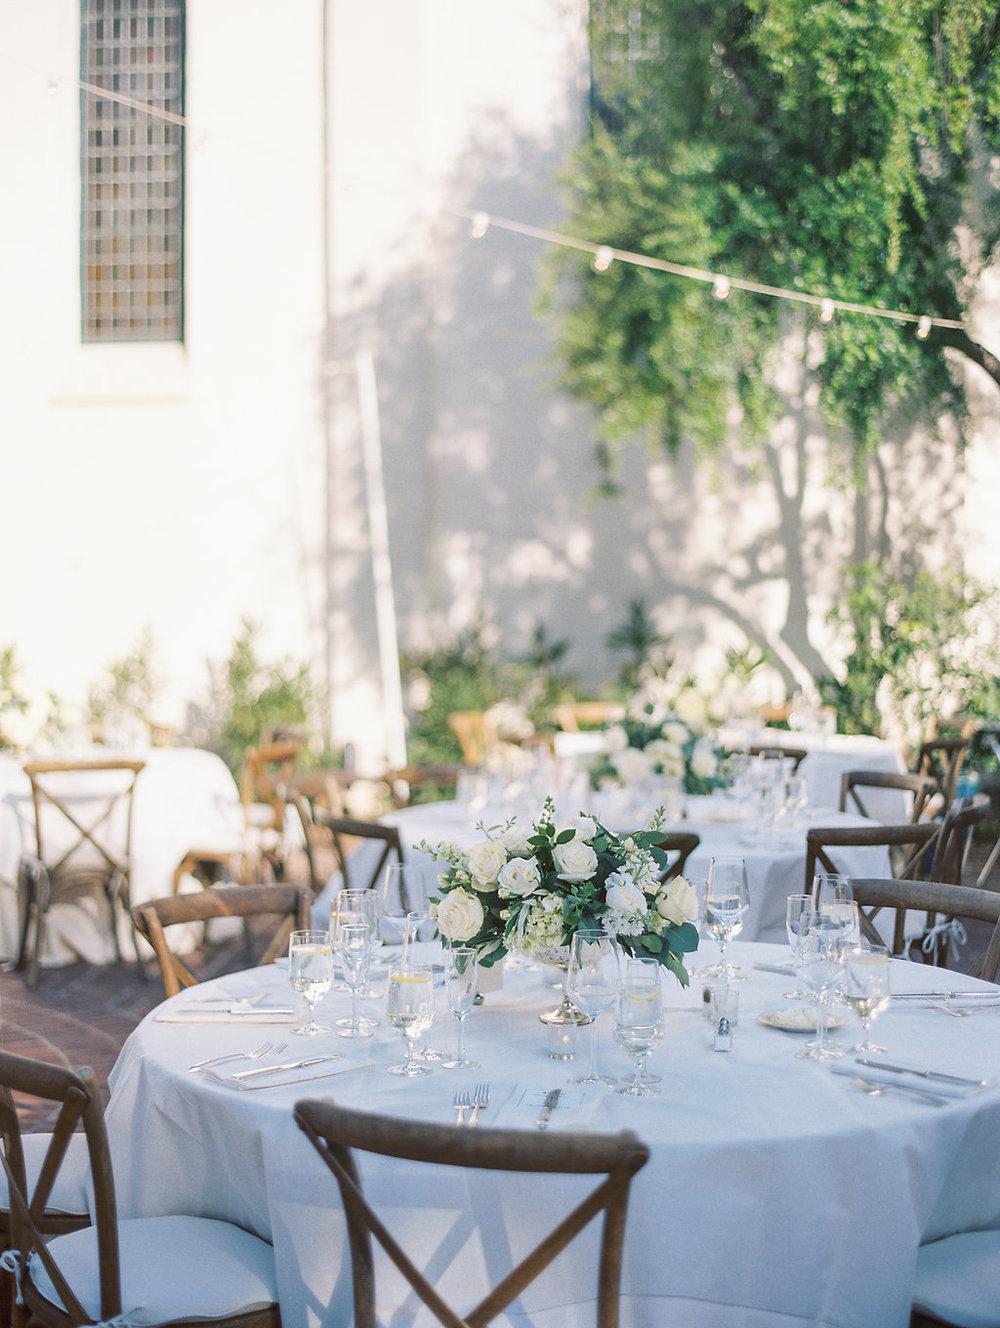 www.santabarbarawedding.com | Unitarian Society | Percy Sales | Steven Leyva | Reception Table